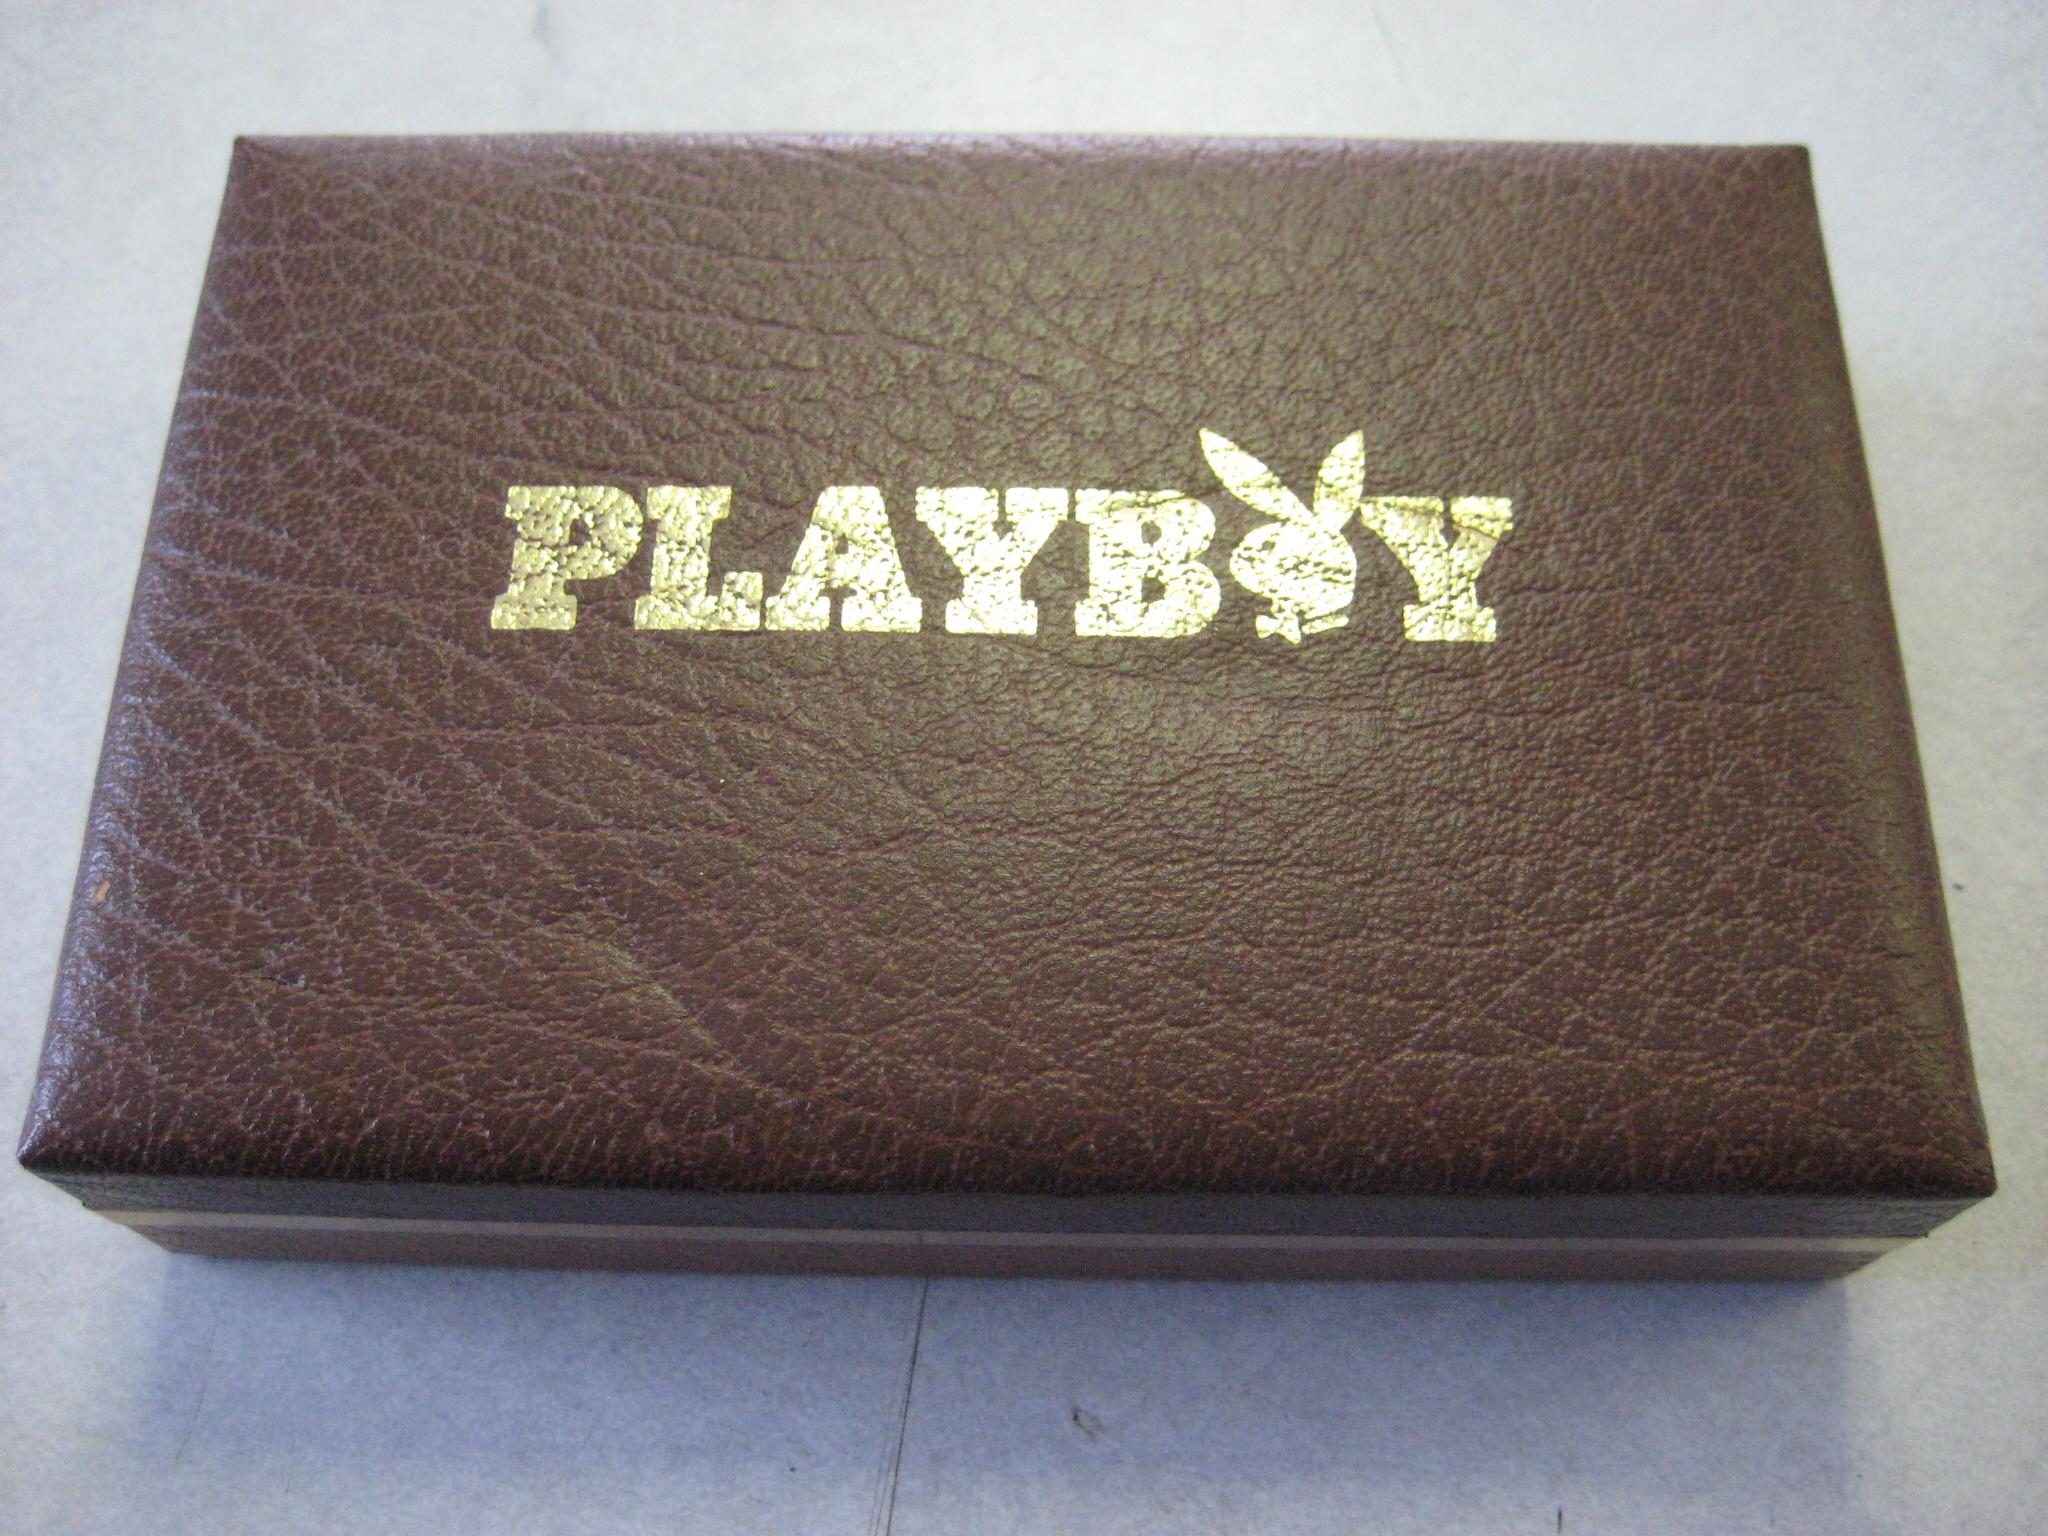 1978 Playboy Vip Cards